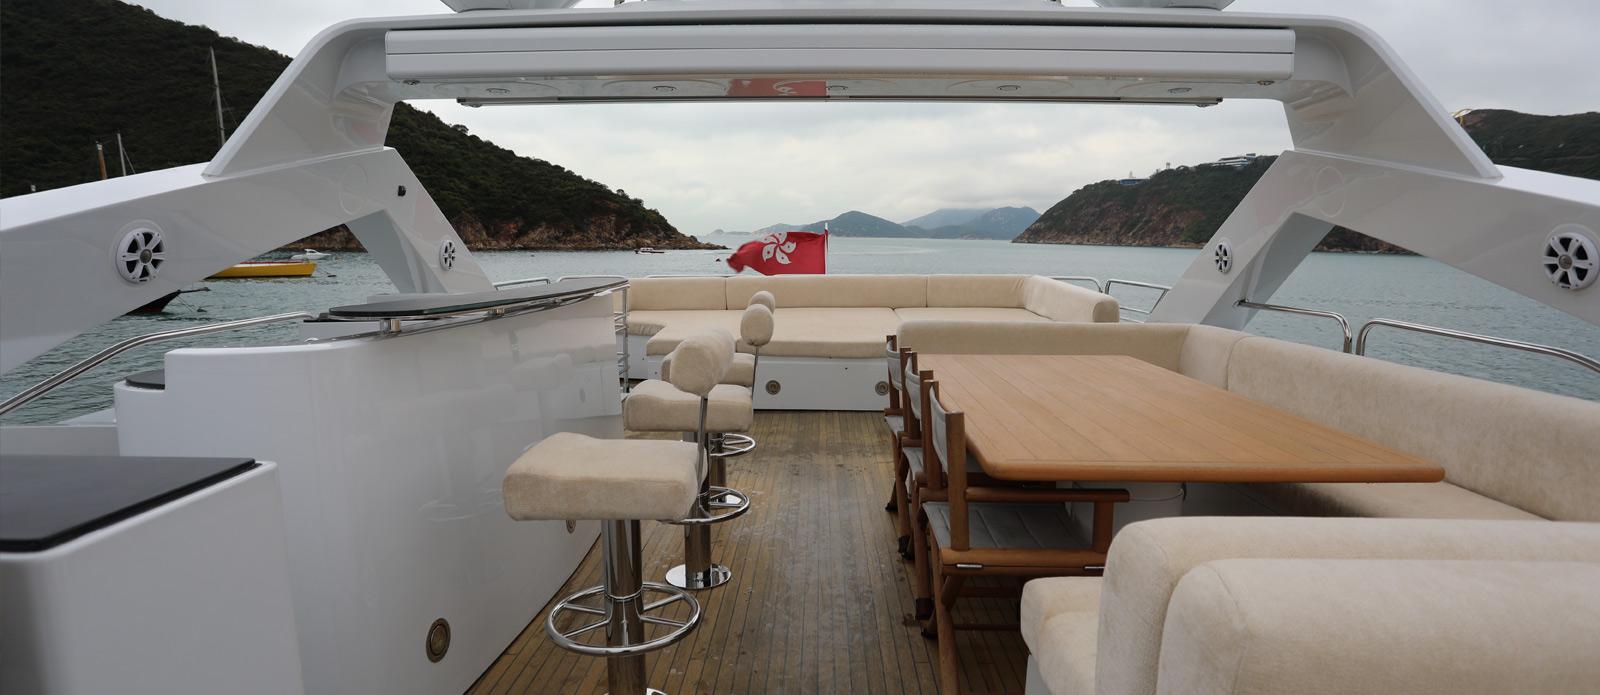 Sunseeker-30-Metre-Yacht-Coraysa-Flybridge-1